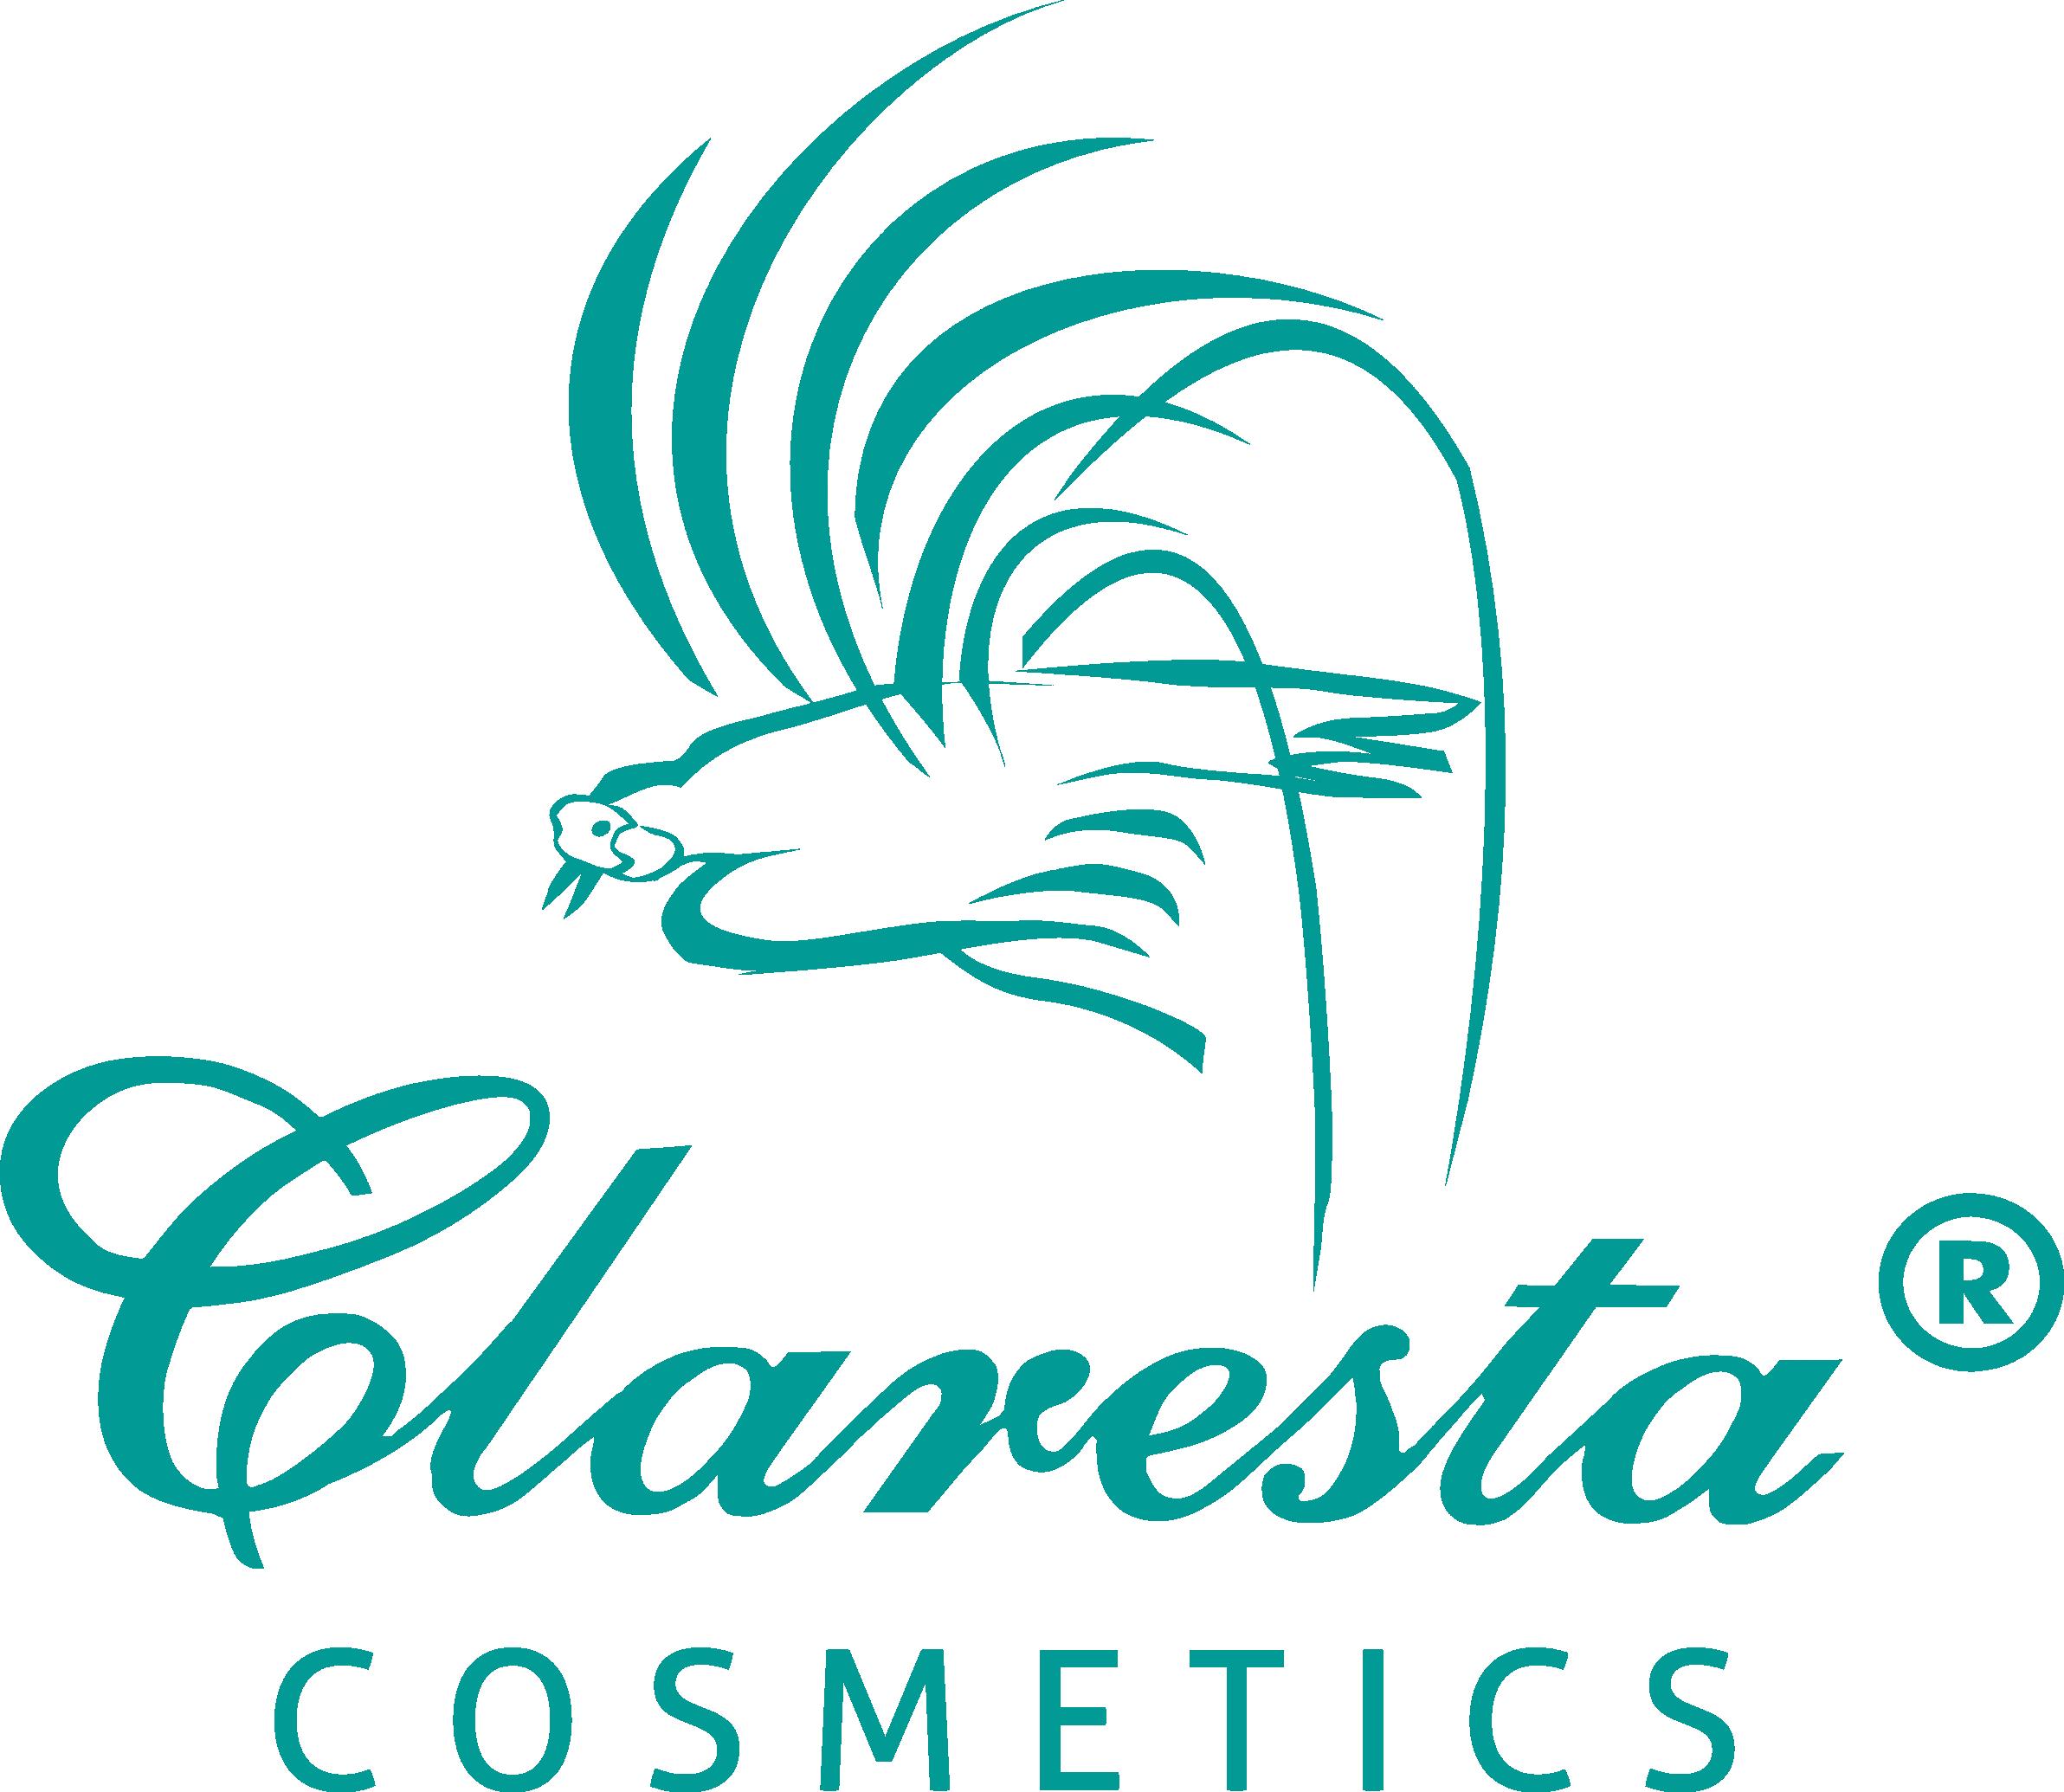 Claresta Logo